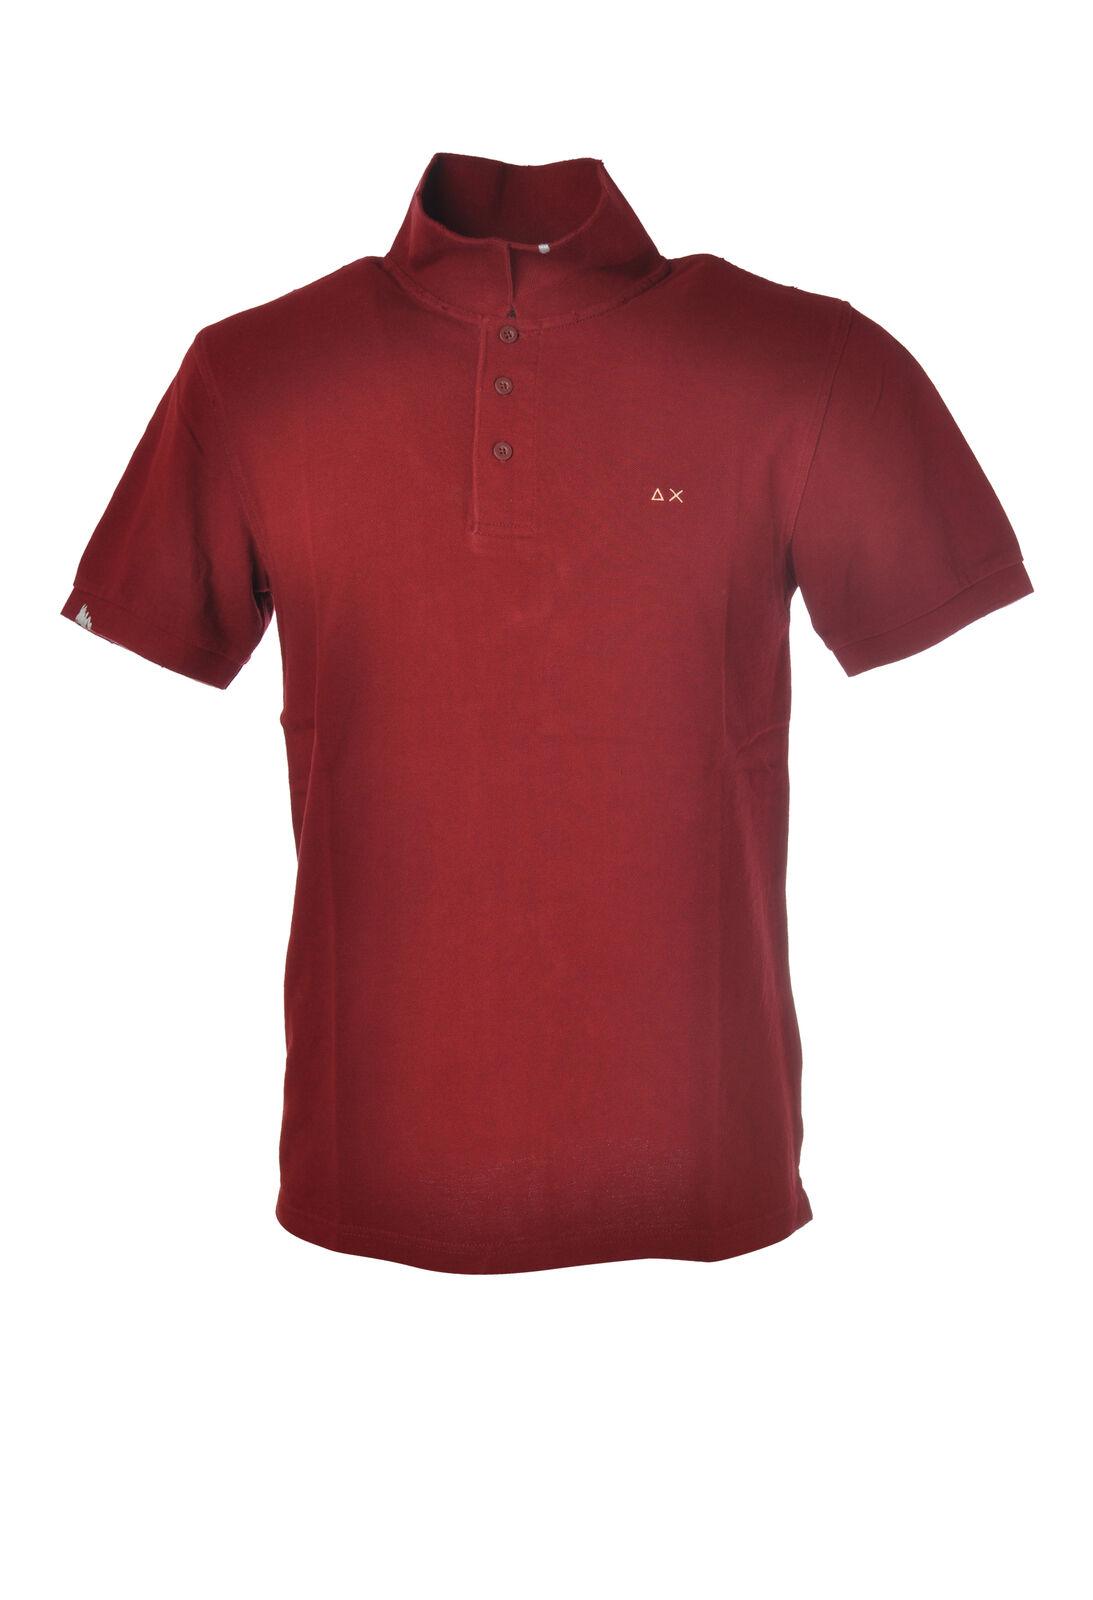 Sun 68 - Topwear Polo - Mann - red - 6000613C190859